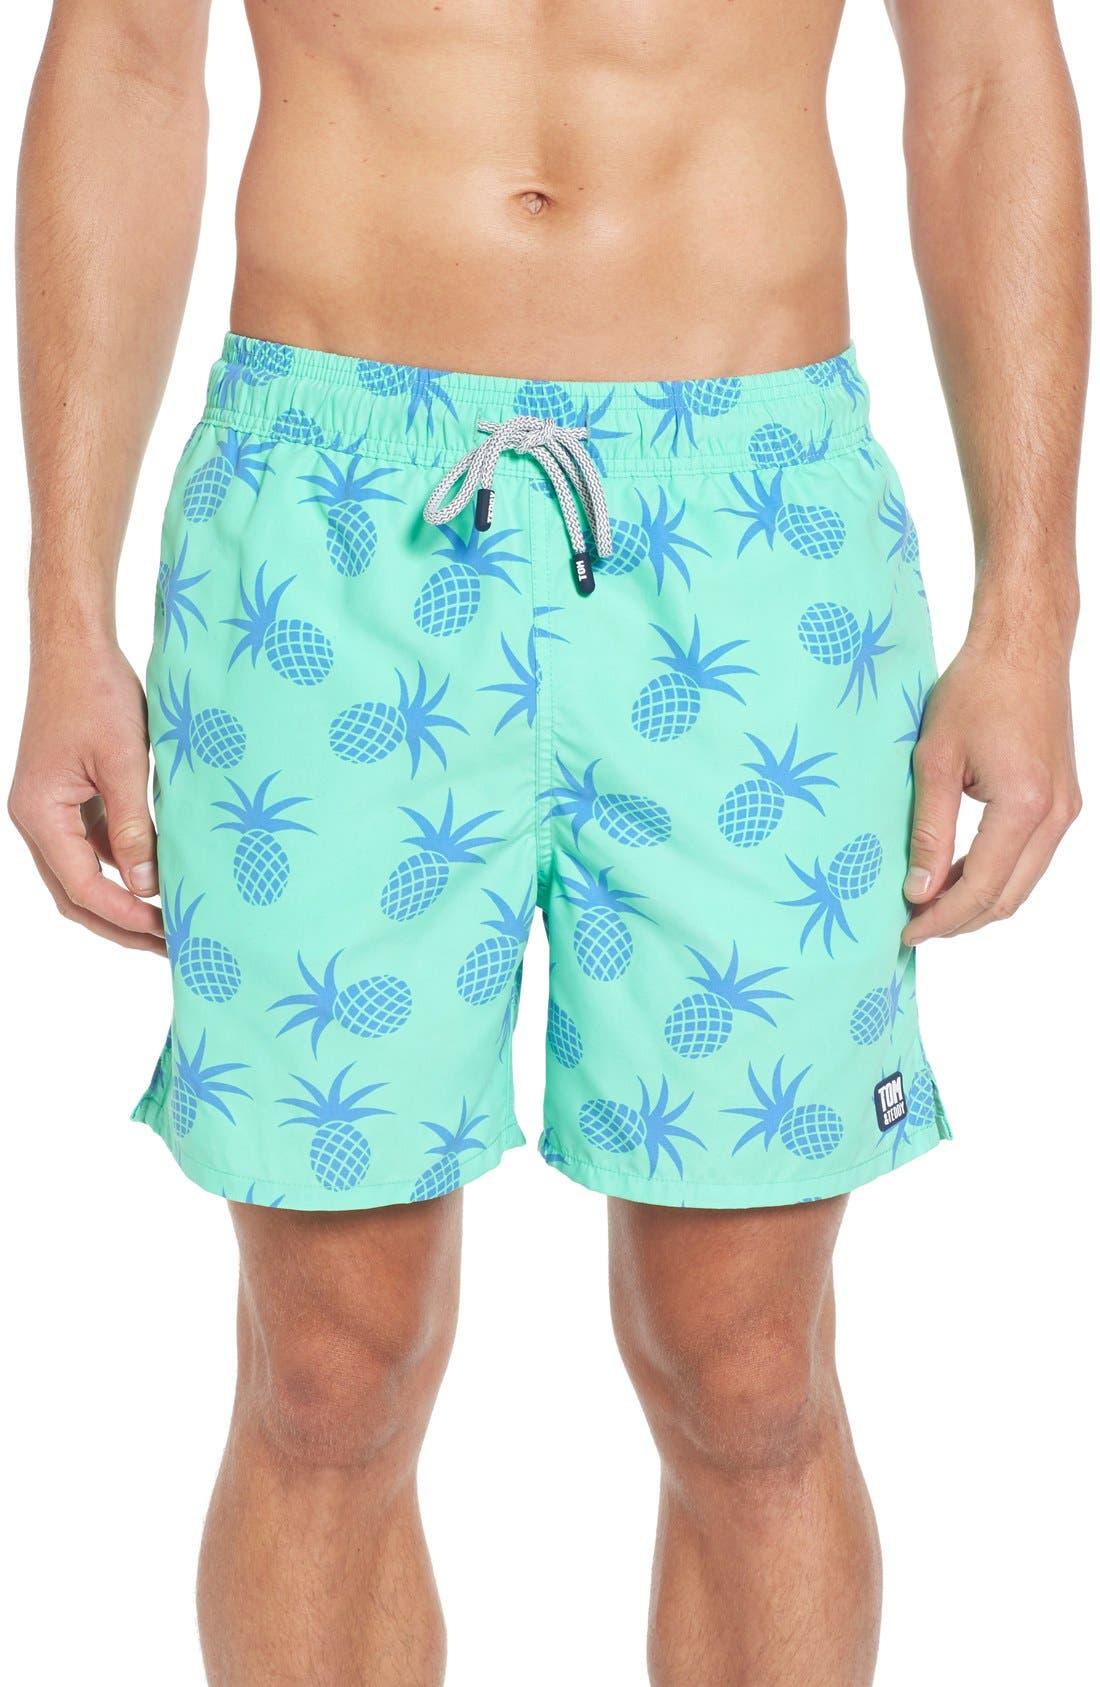 Tom & Teddy Pineapple Print Swim Trunks